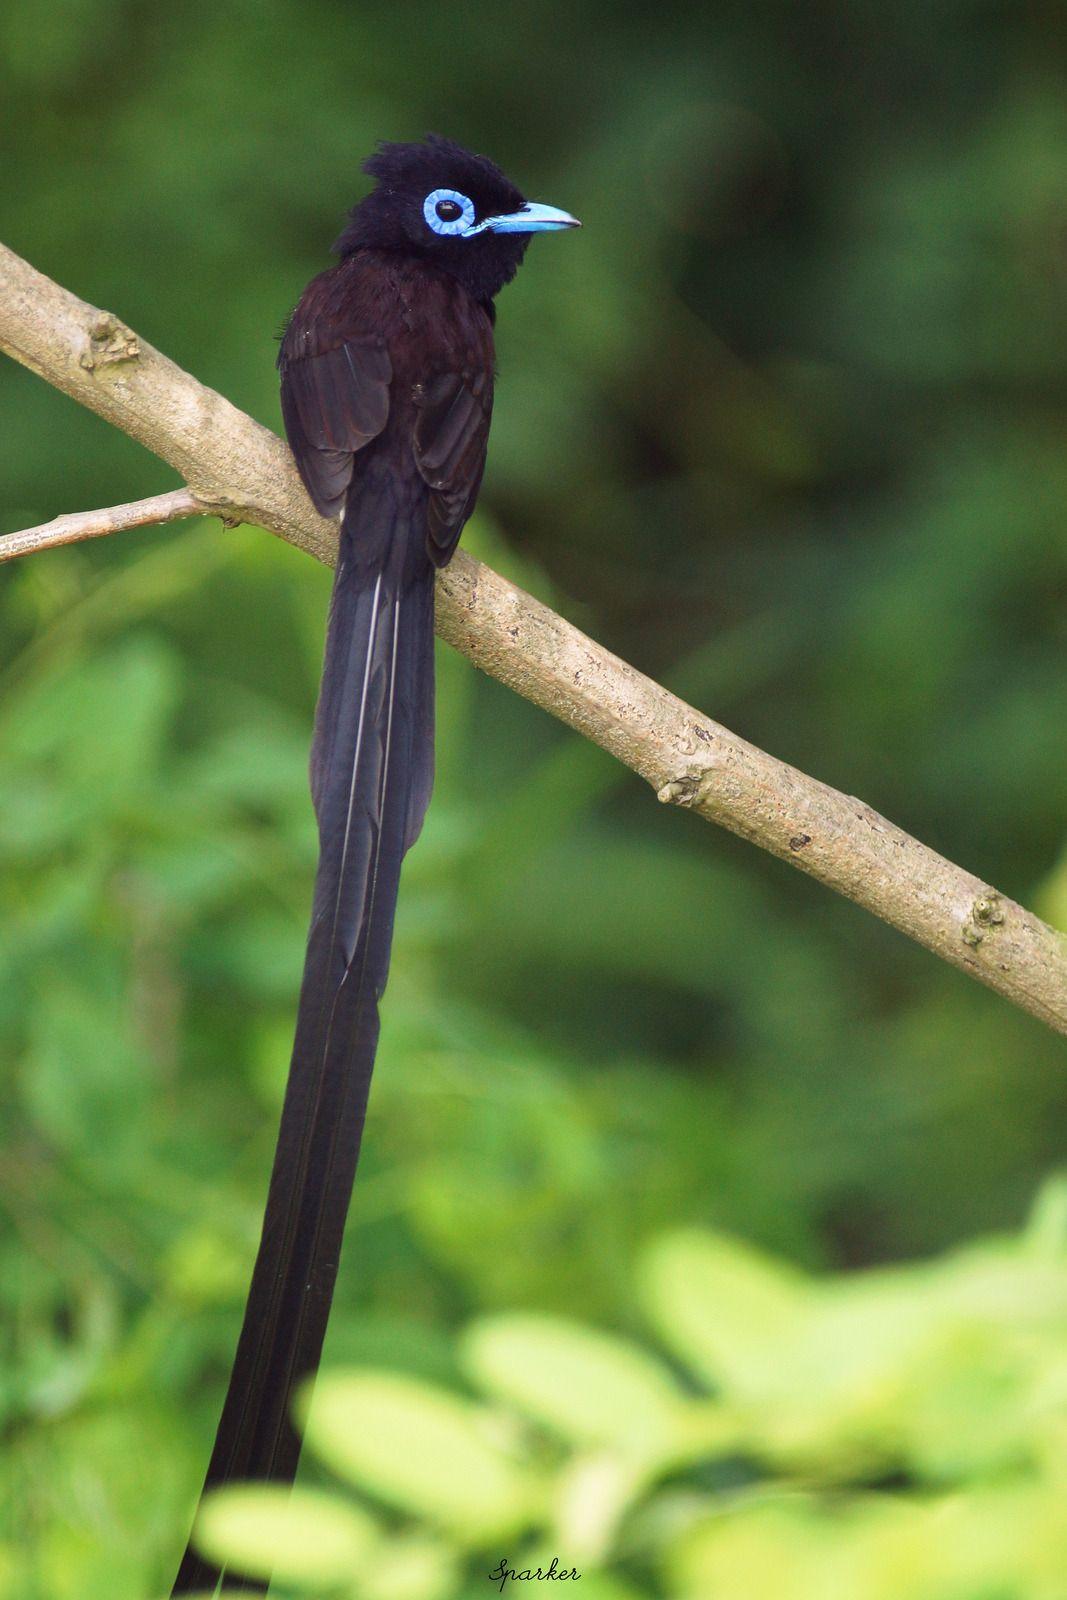 Pin on Aves. MONARCHIDAE (paradise flycatchers